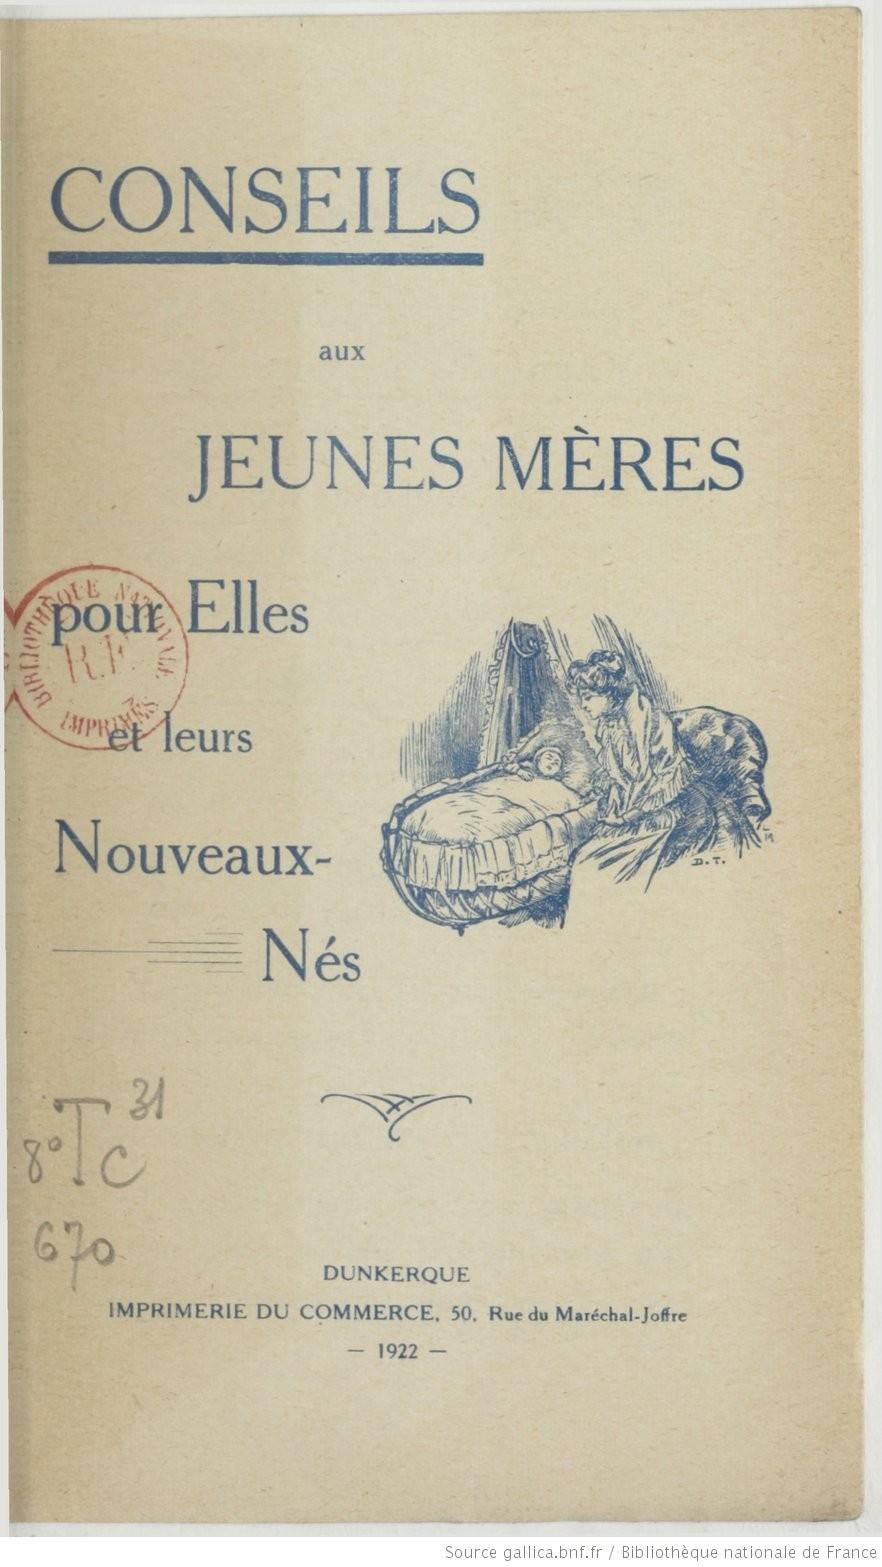 http://gallica.bnf.fr/ark:/12148/bpt6k6464721n.thumbnail.highres.jpg